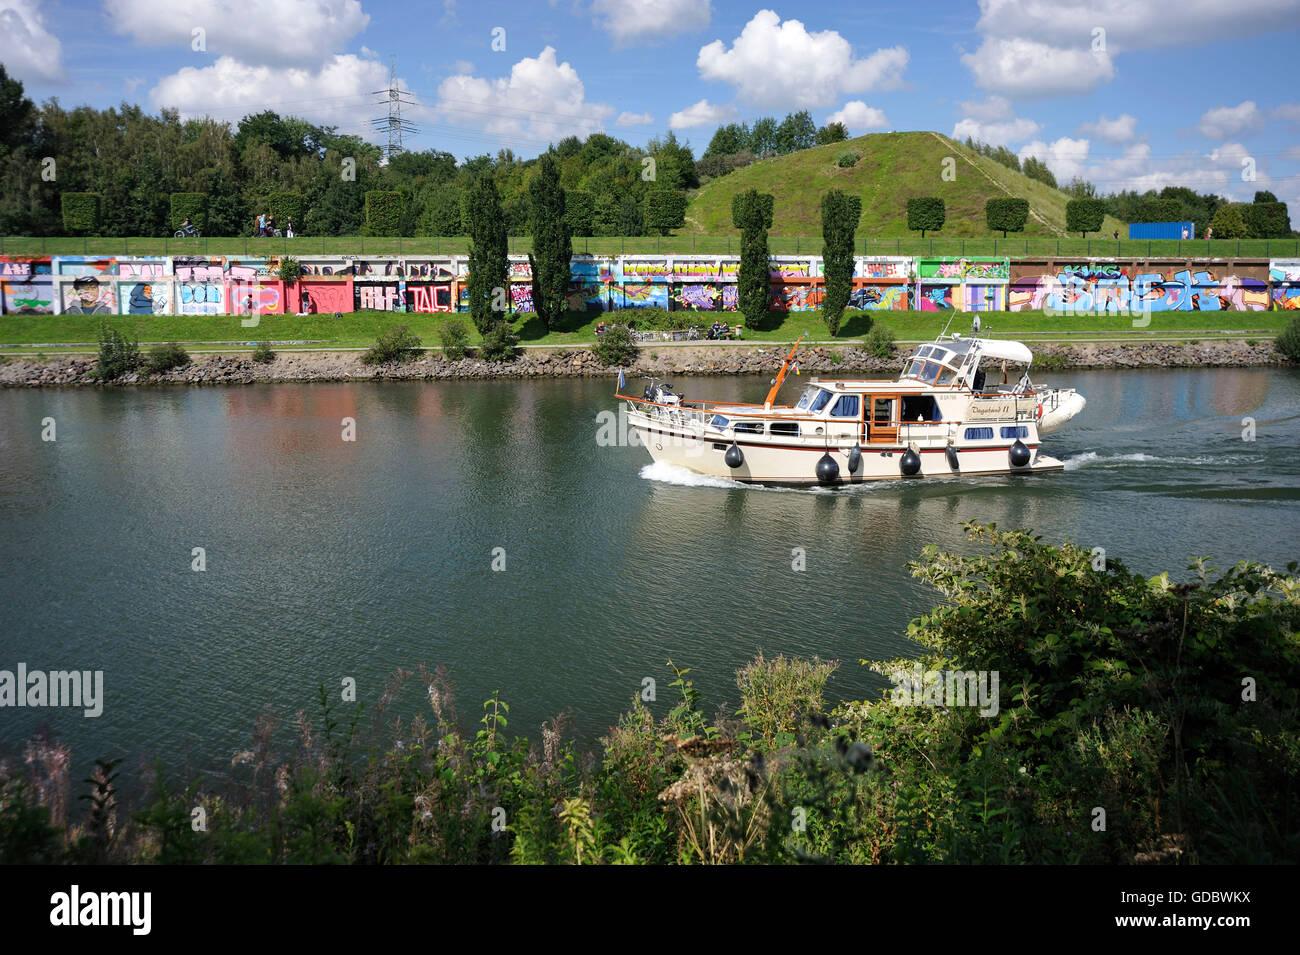 Rhine-Herne canal, North Star park, Gelsenkirchen, Ruhr area, North Rhine-Westphalia, Germany / Nordsternpark - Stock Image